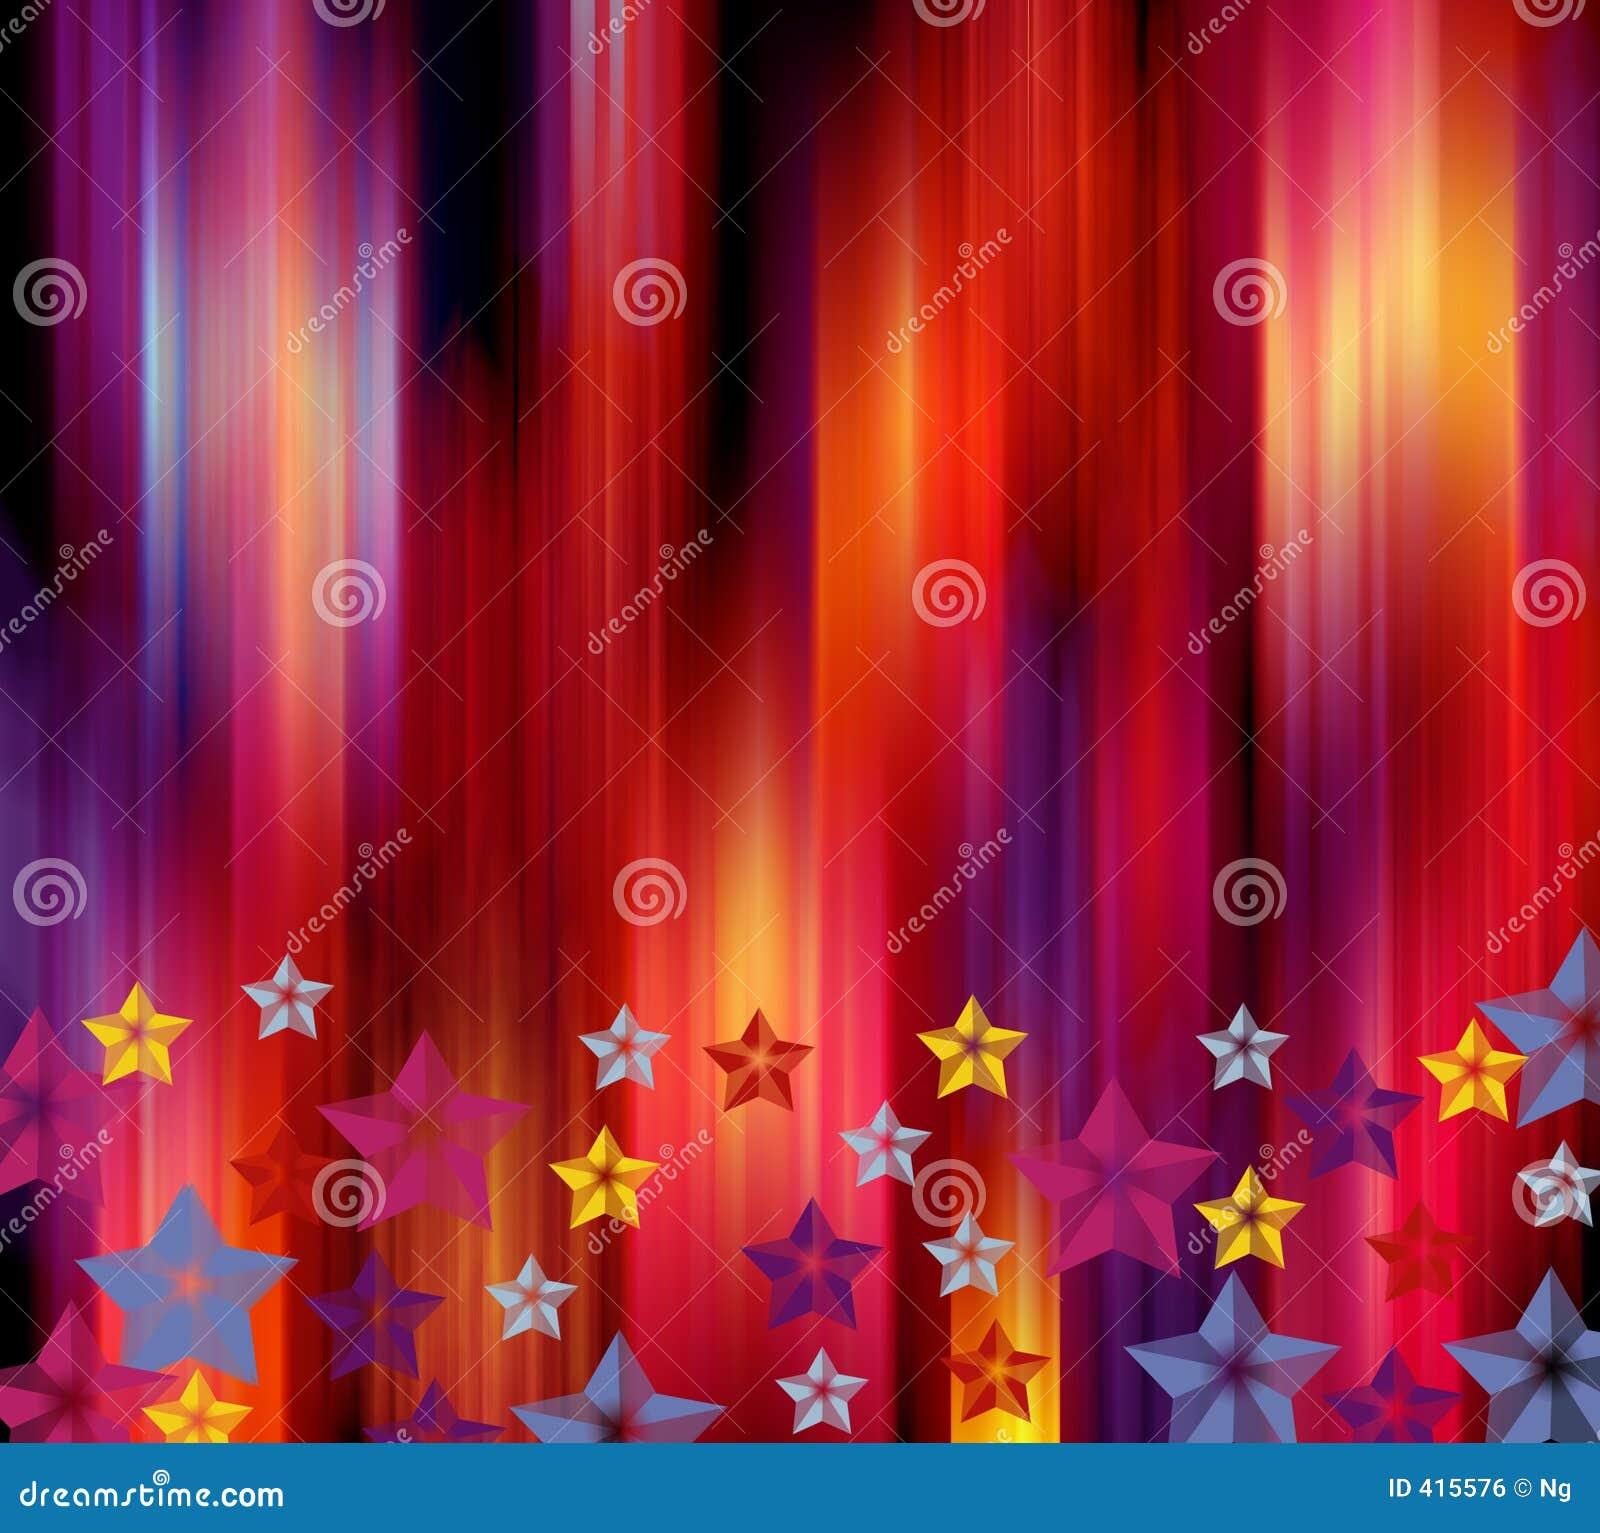 Vibrant holiday background